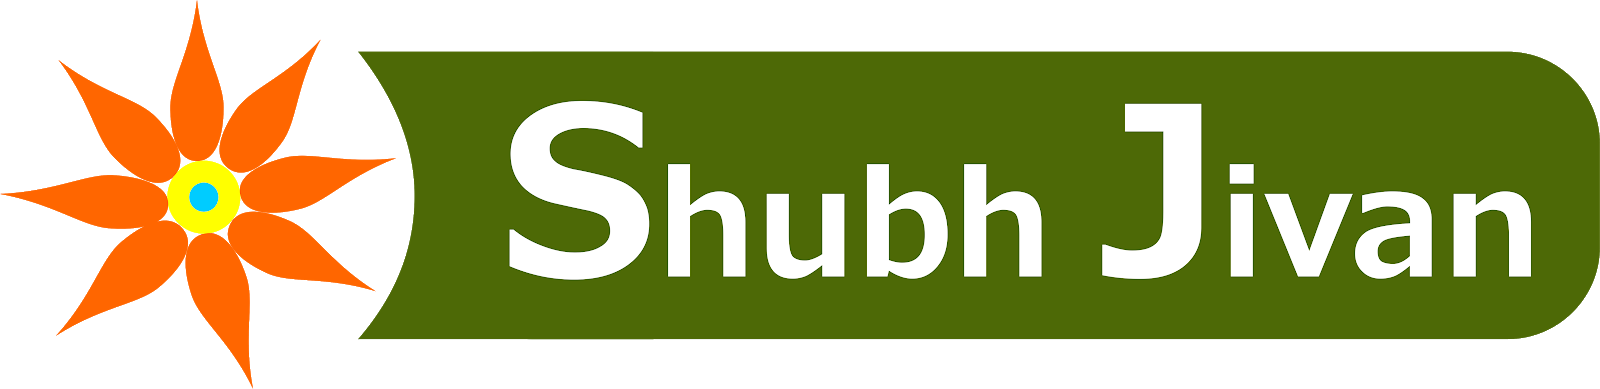 Shubh Jivan